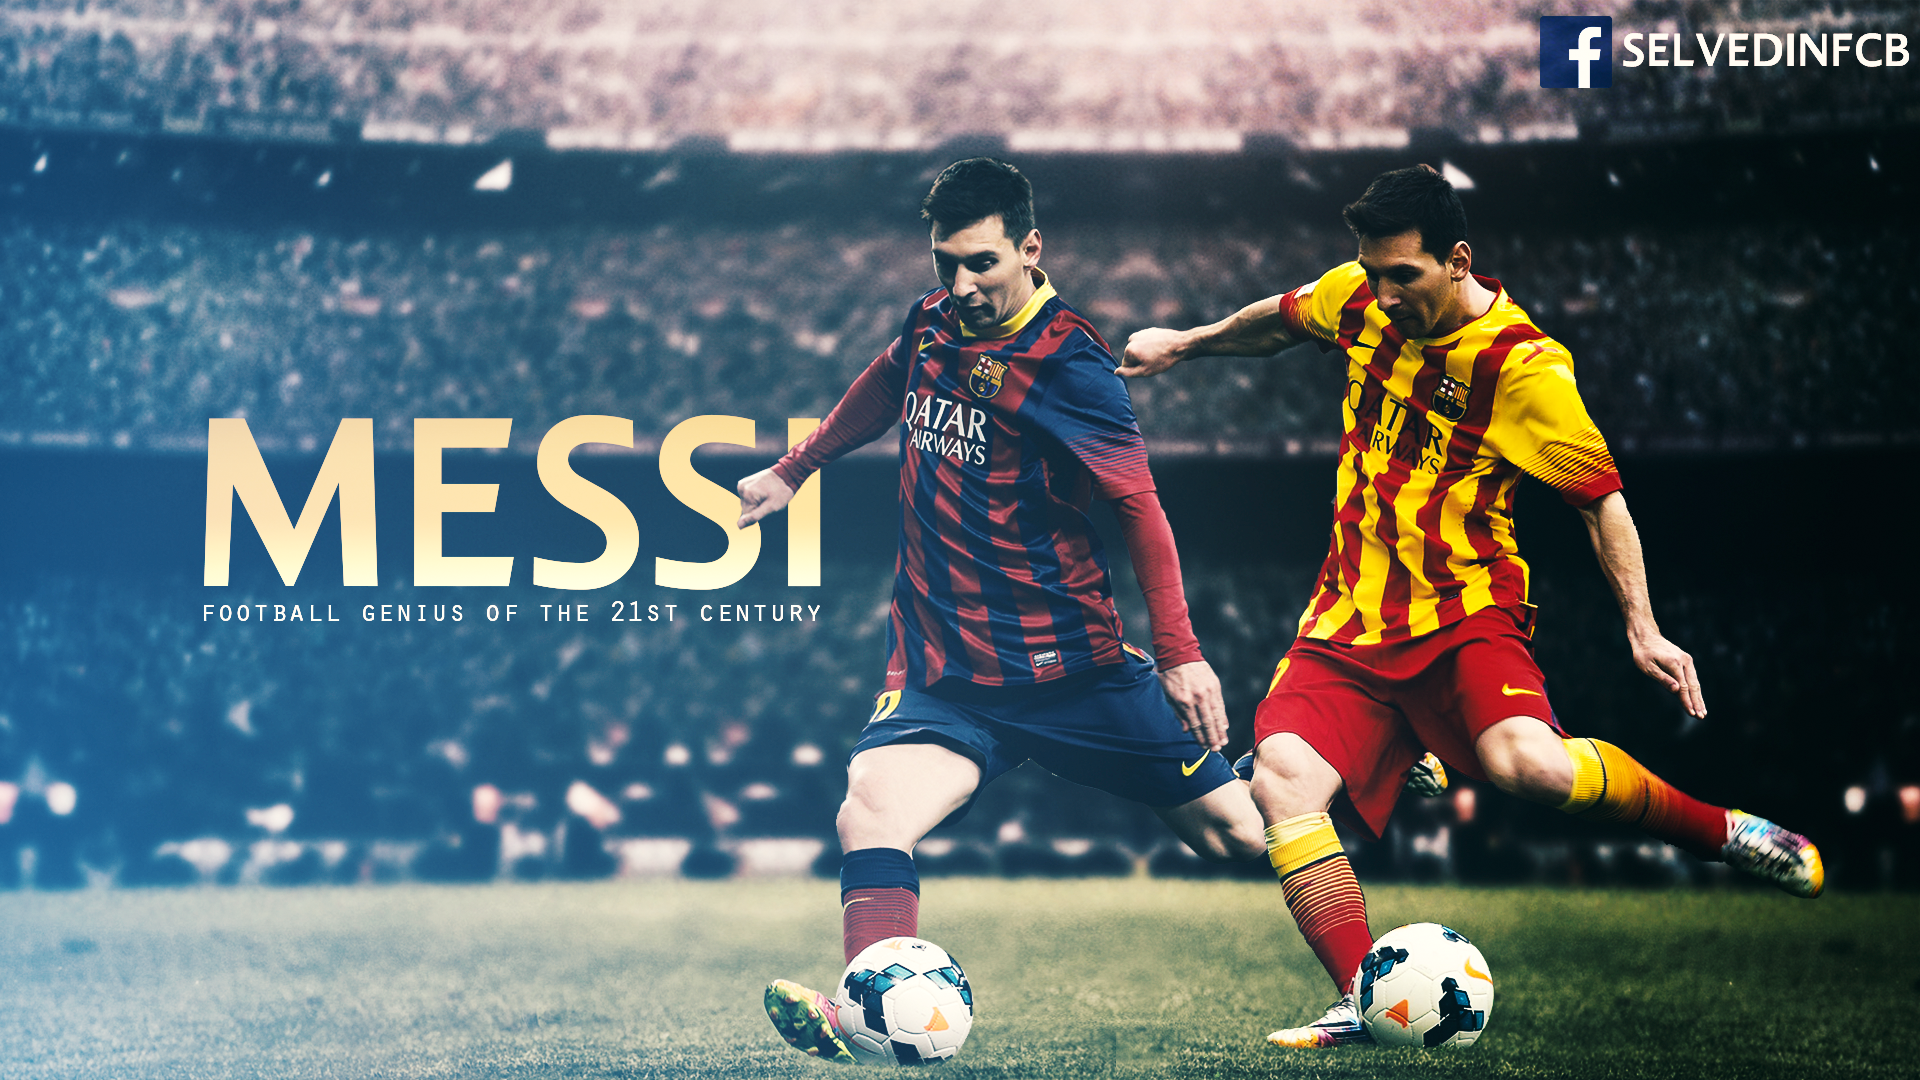 Lionel Messi Wallpaper HD 2014 Free download ~ Wallpaper ...